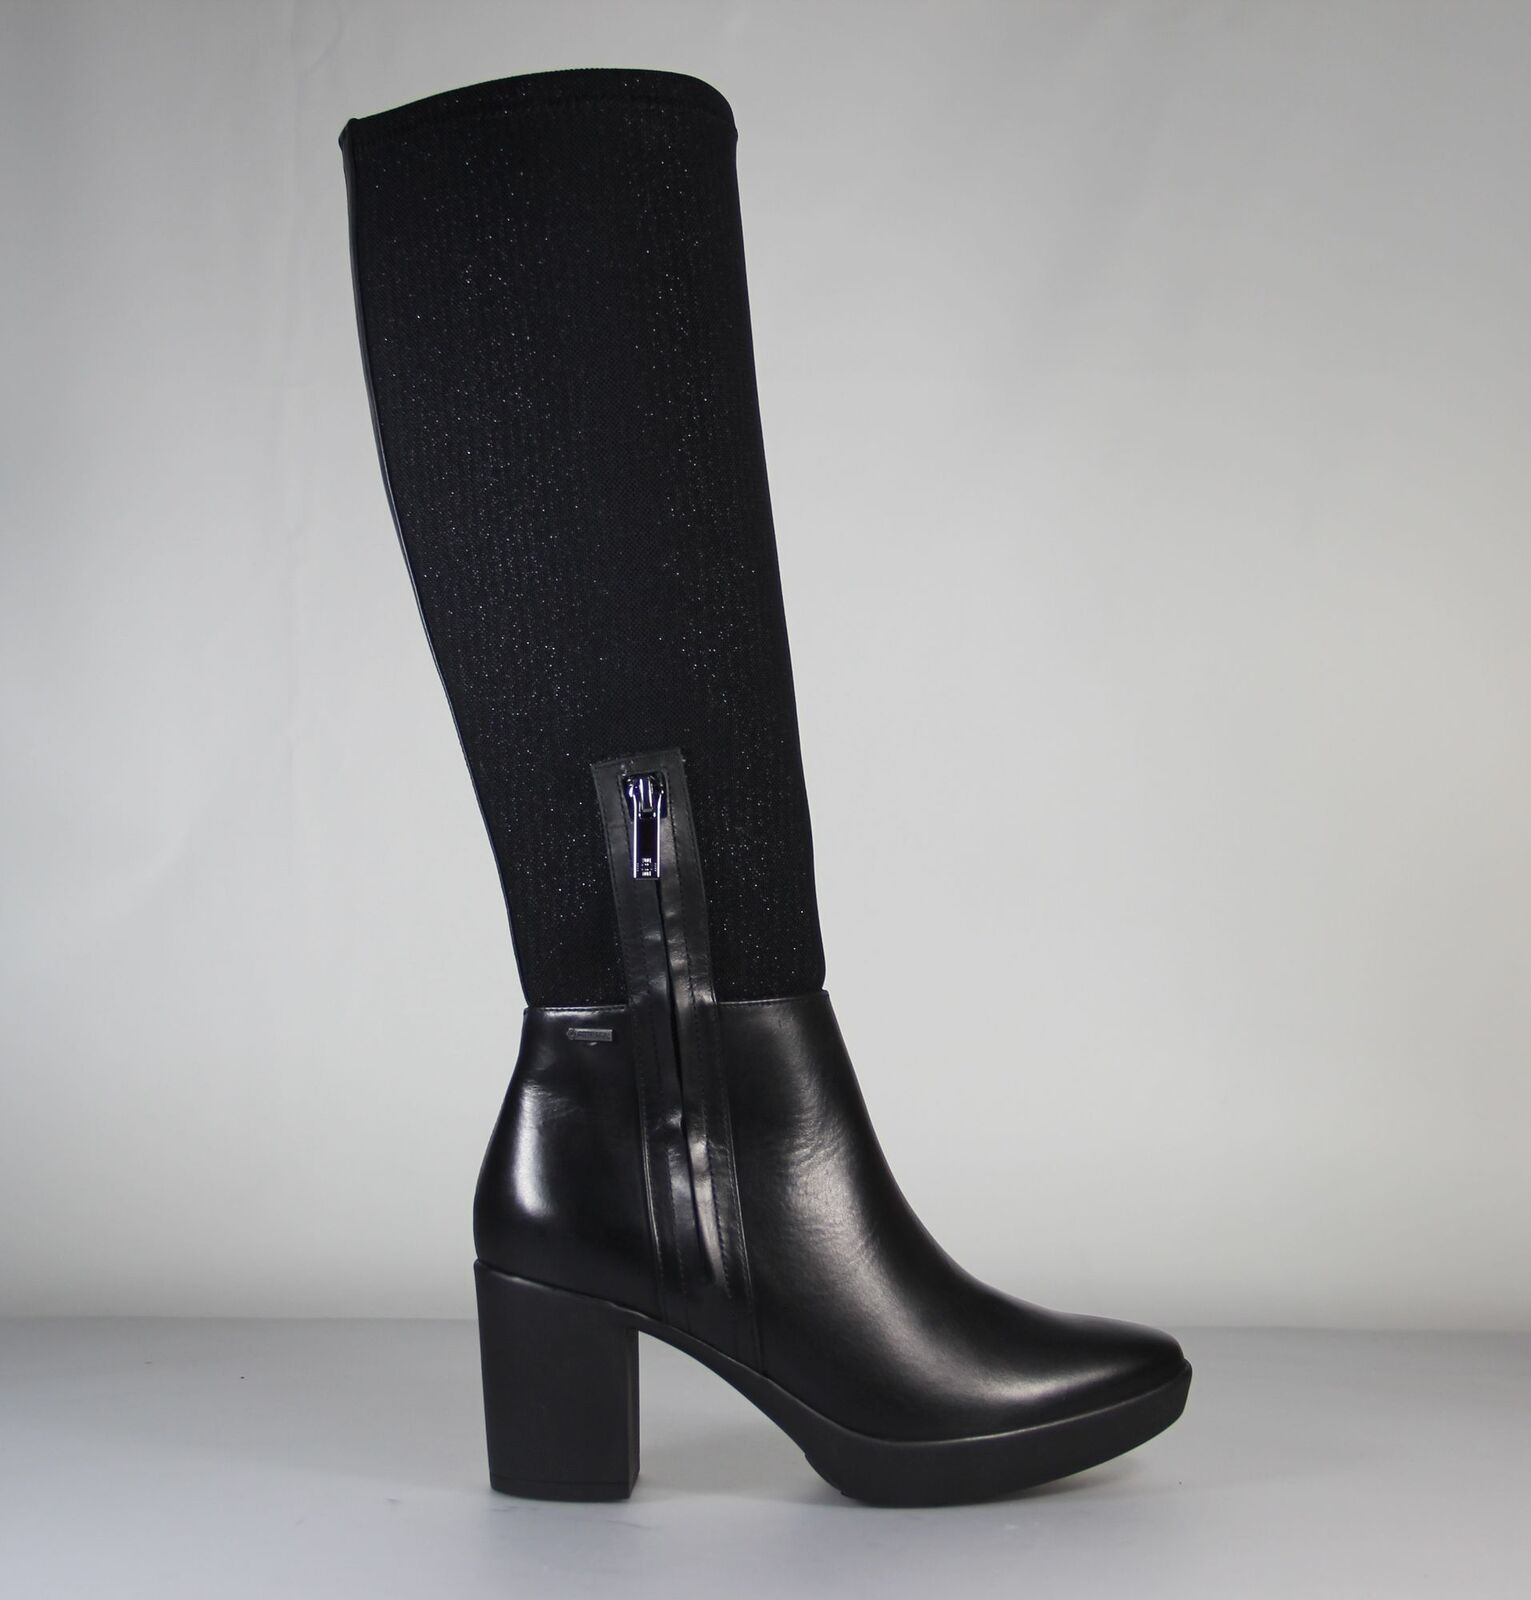 HÖGL DRY PREMIUMCALF LEDER Damen Stiefel schwarz 4 10 6840